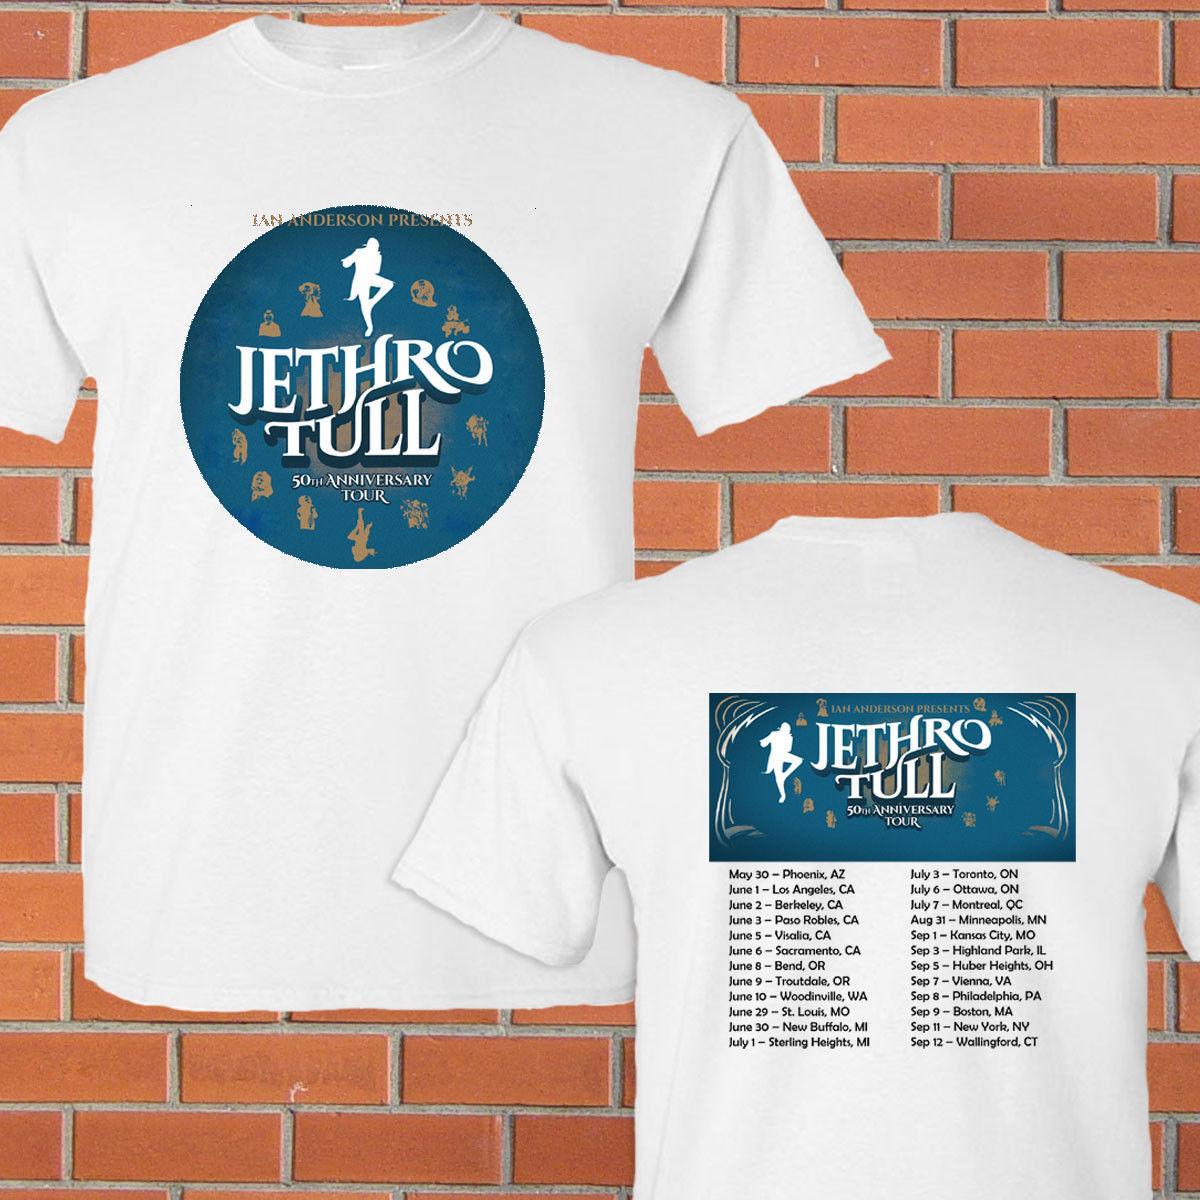 Jethro Tull 50th Anniversary North American Tour 2018 White Tee